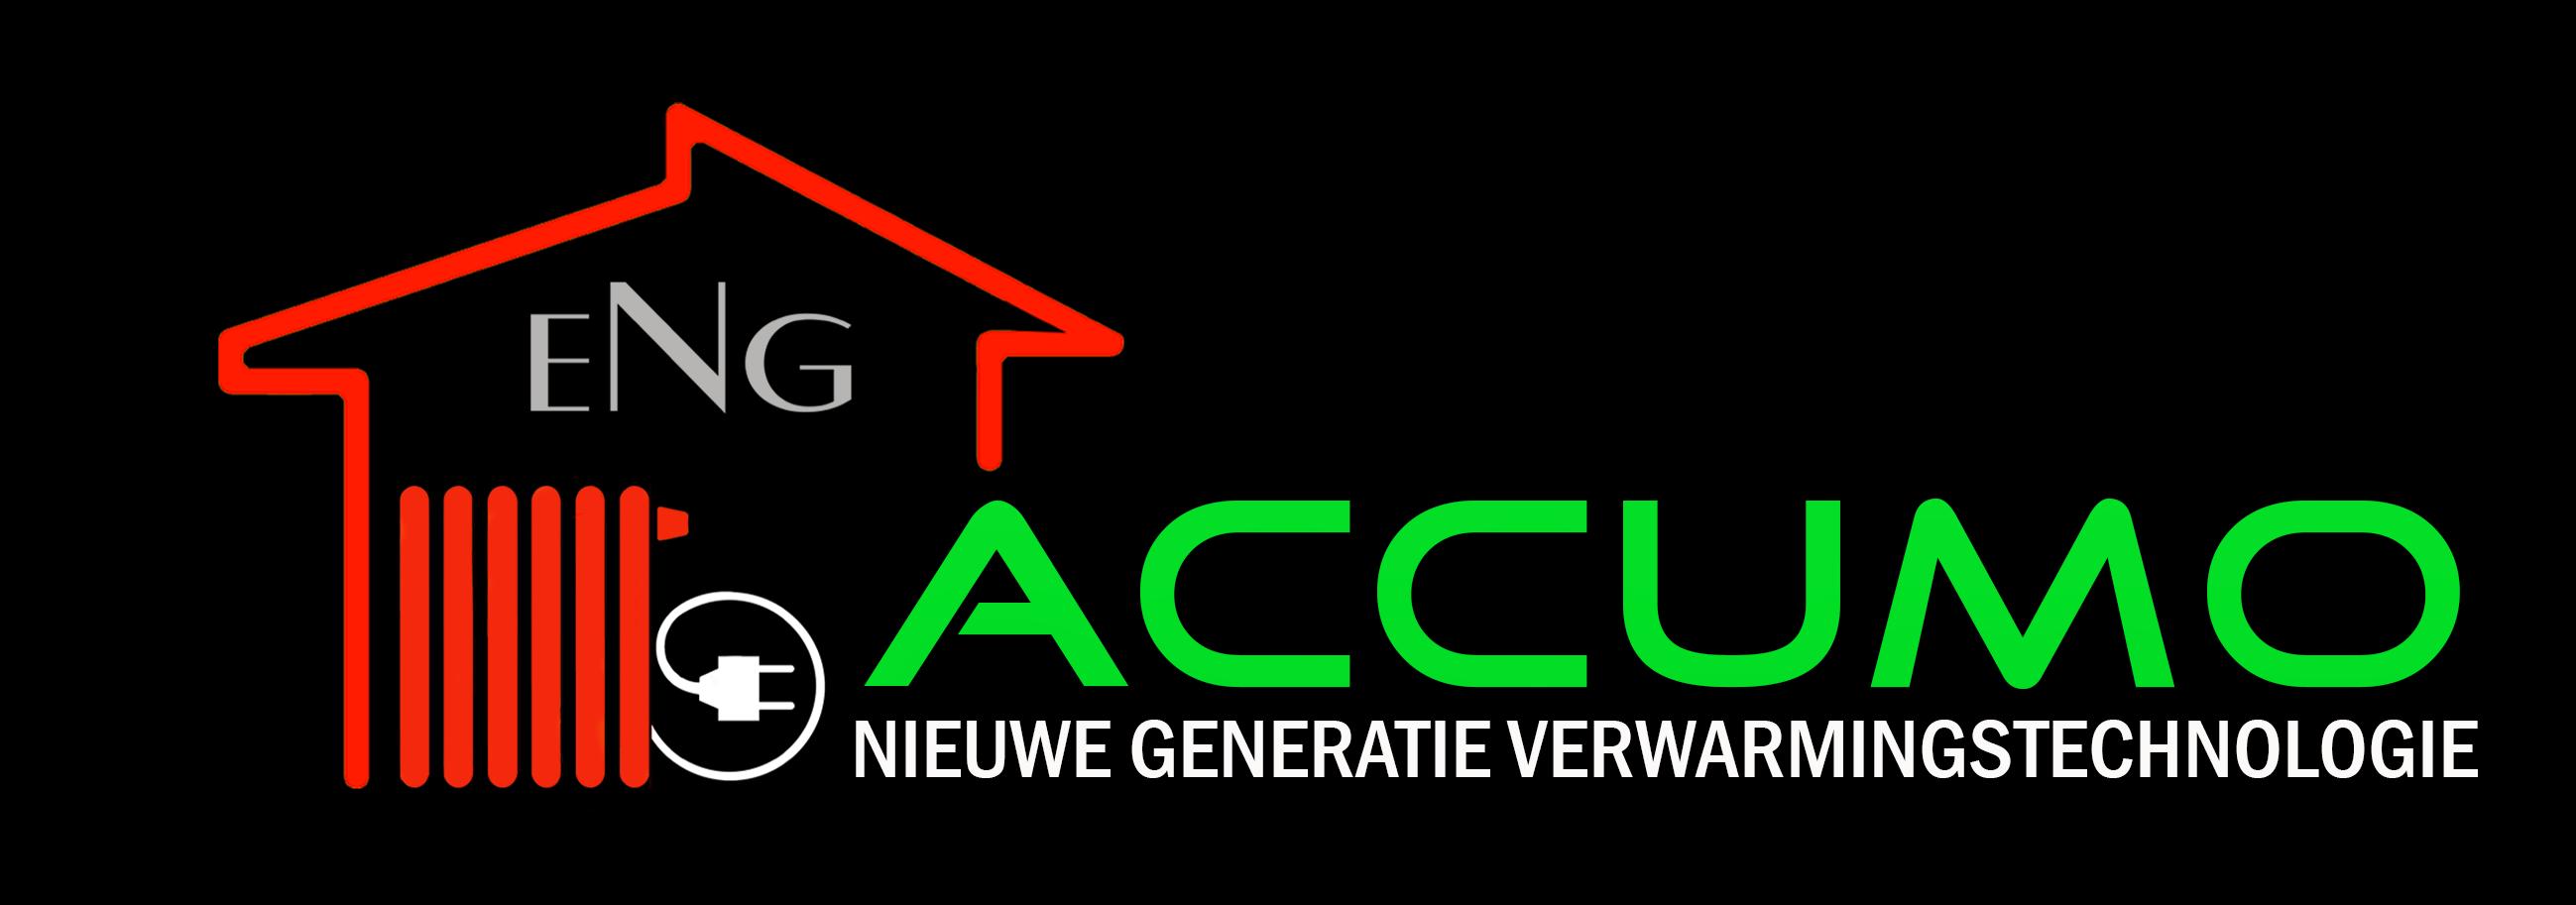 Accumo logo 3 september 2019